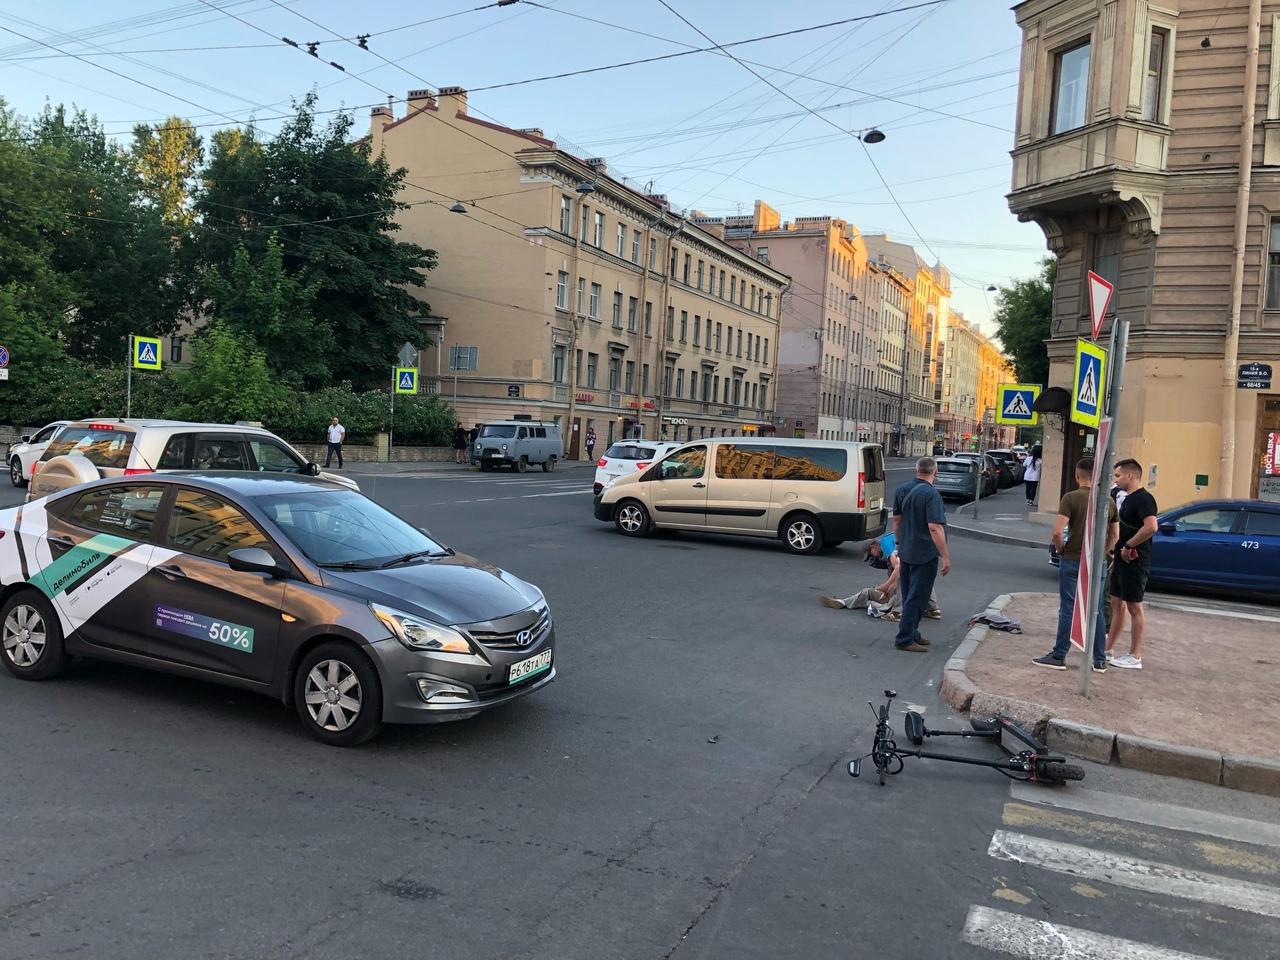 На перекрестке Малого пр. и 15 линии каршеринг сбил мужчину на самокате.